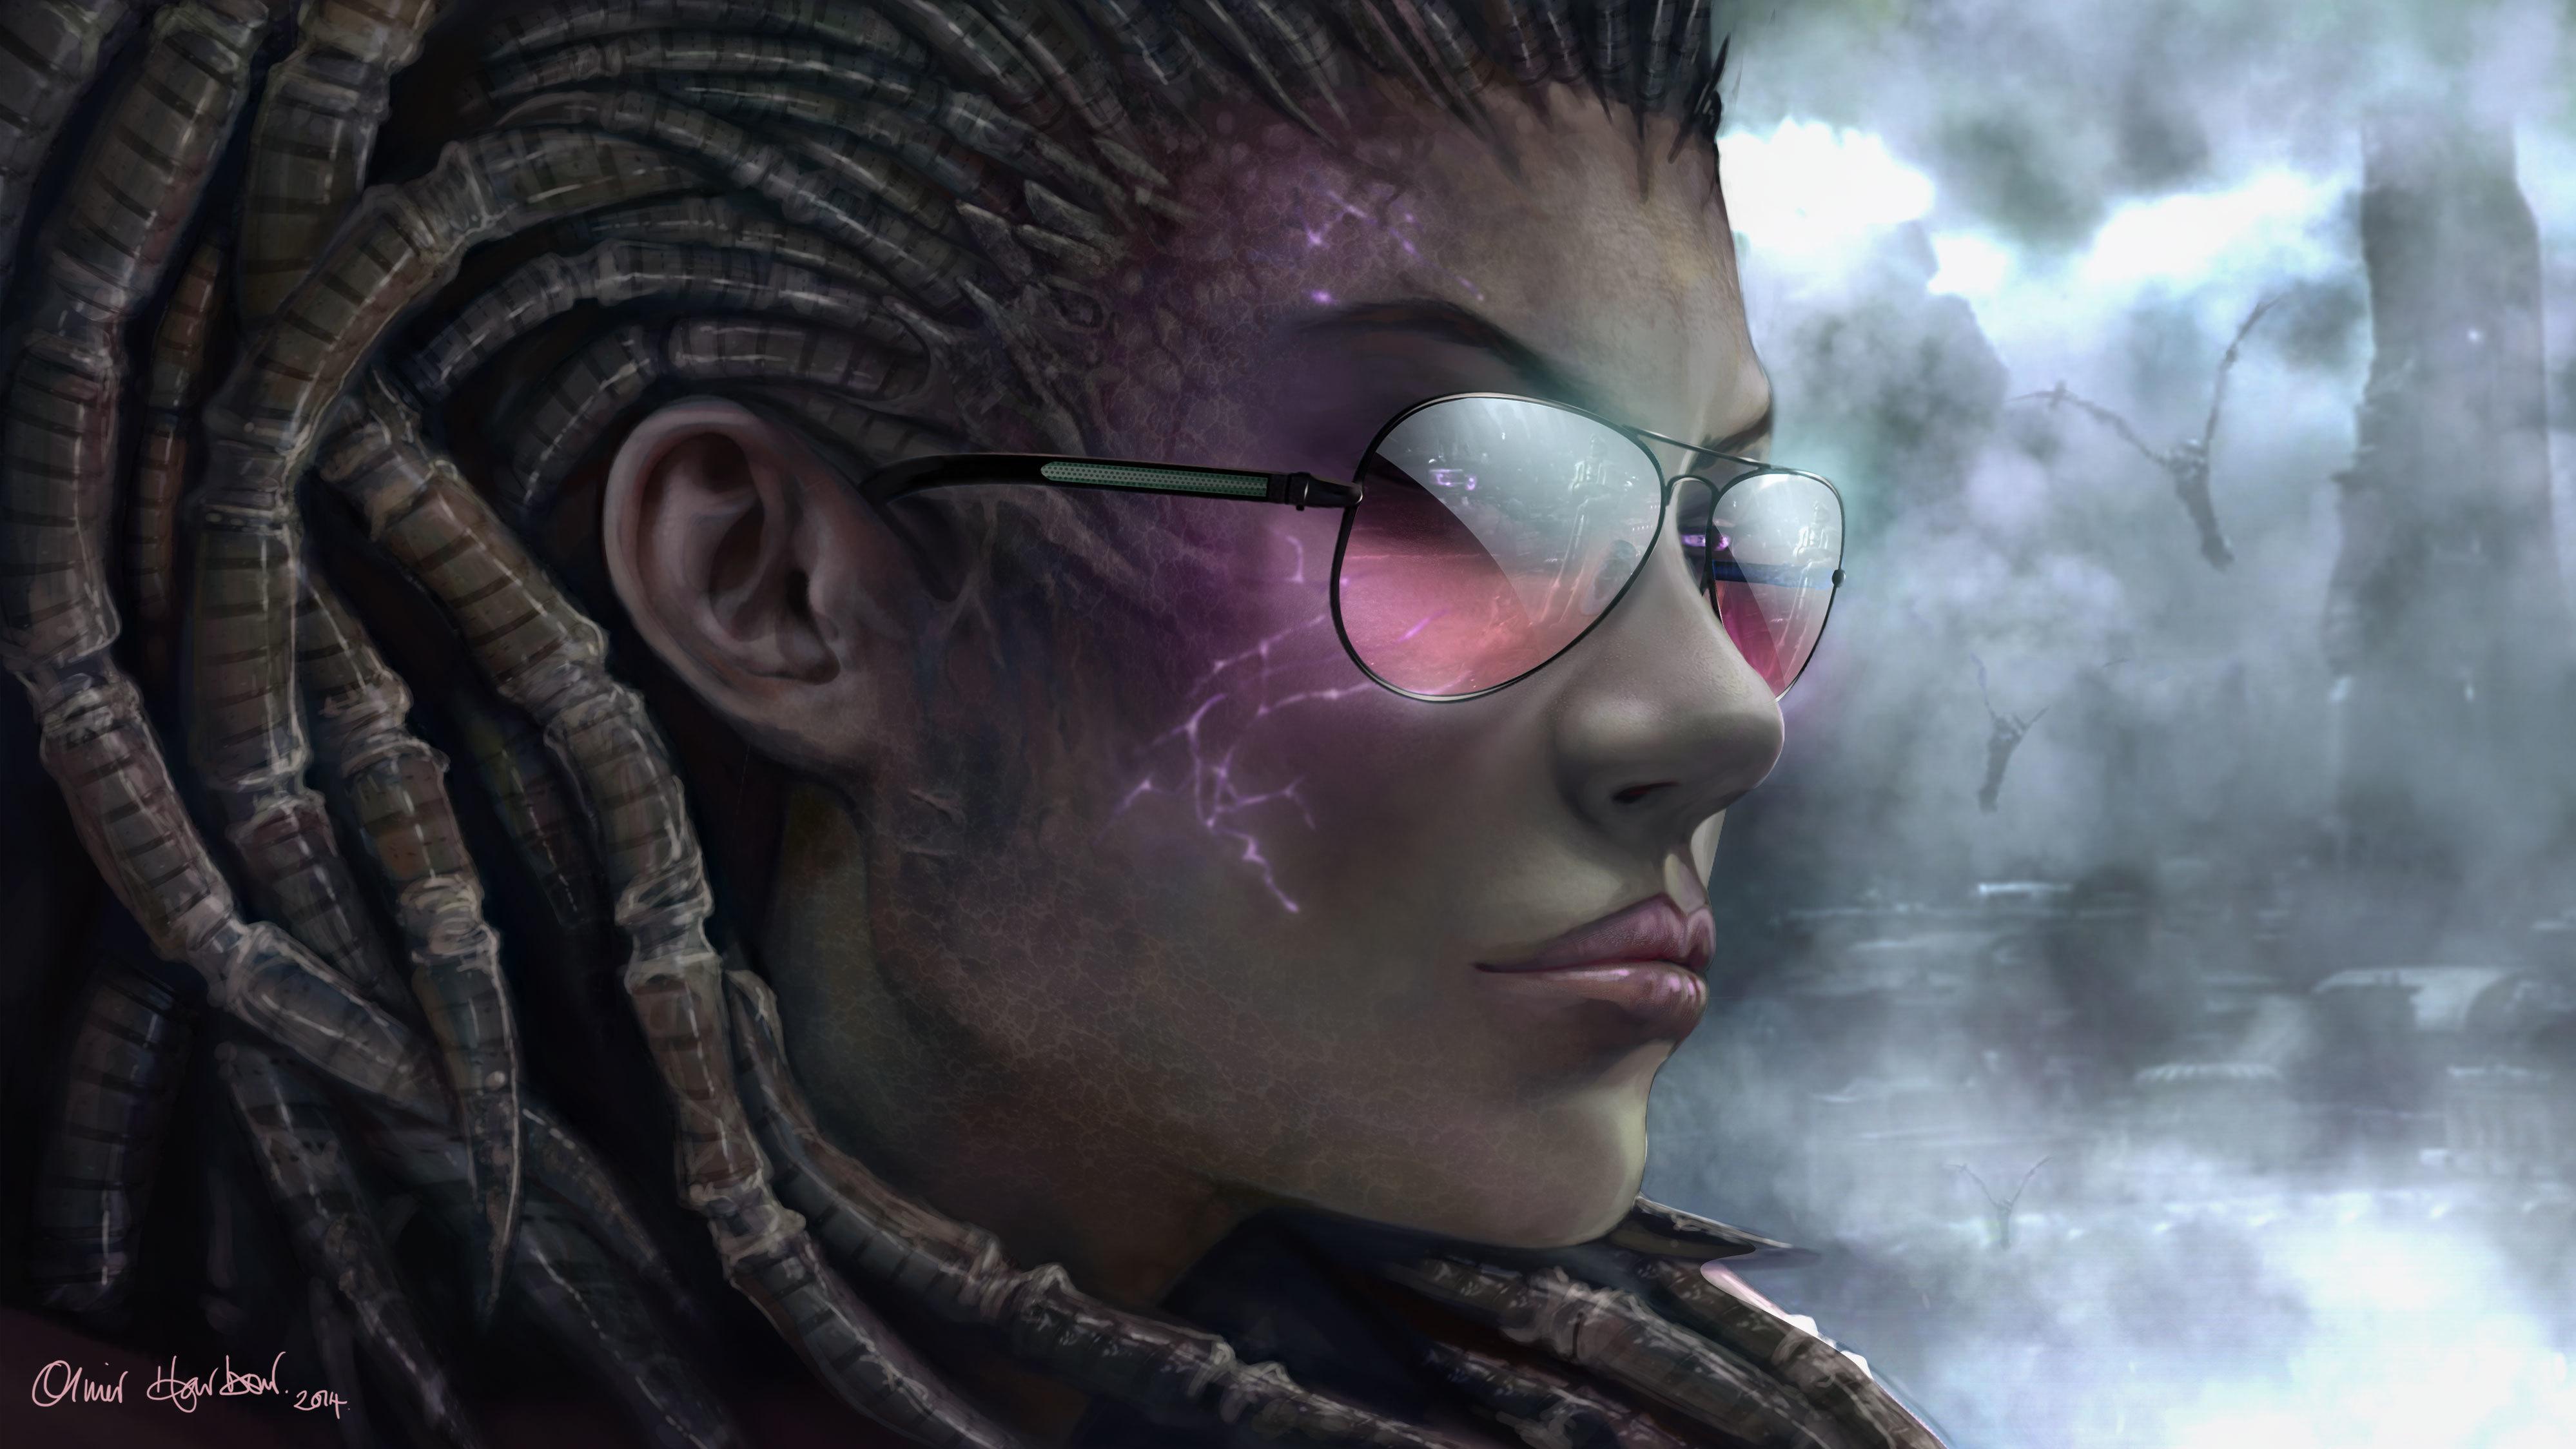 Fantasy Girl Hd Wallpaper Free Download Image Starcraft 2 Queen Of Blades Sarah Kerrigan Girl